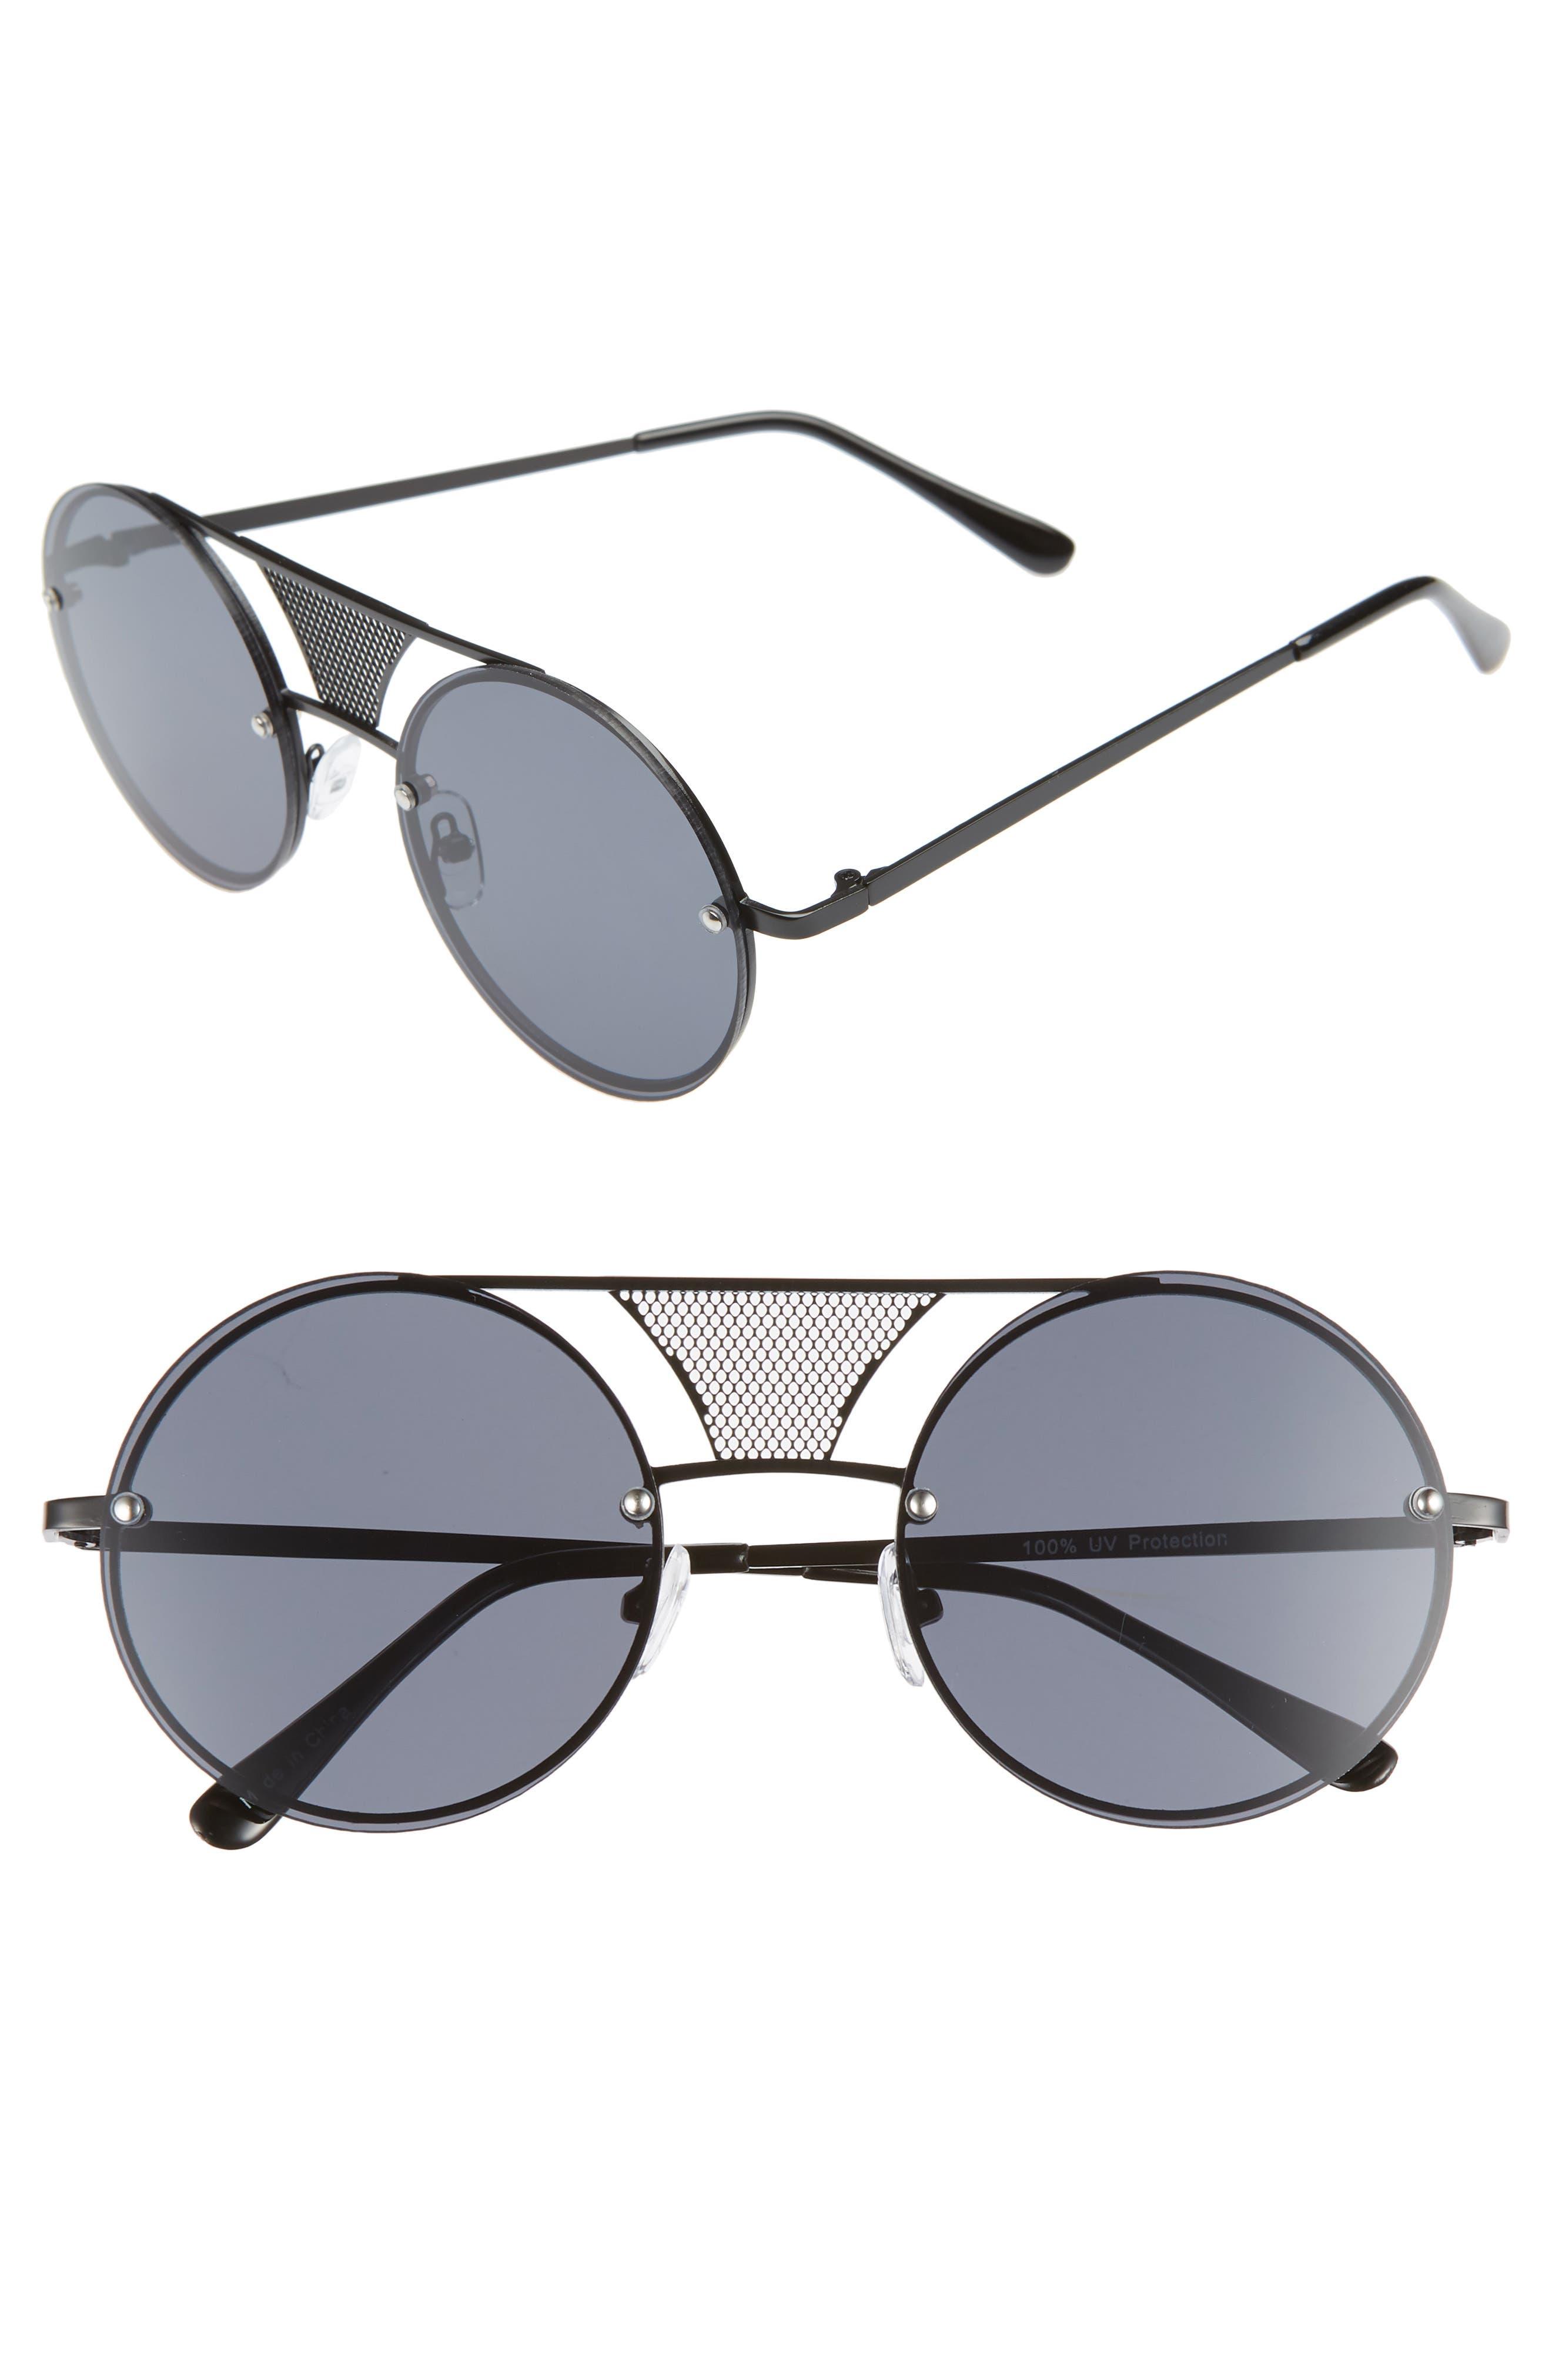 52mm Mesh Browbar Round Aviator Sunglasses,                             Main thumbnail 1, color,                             BLACK